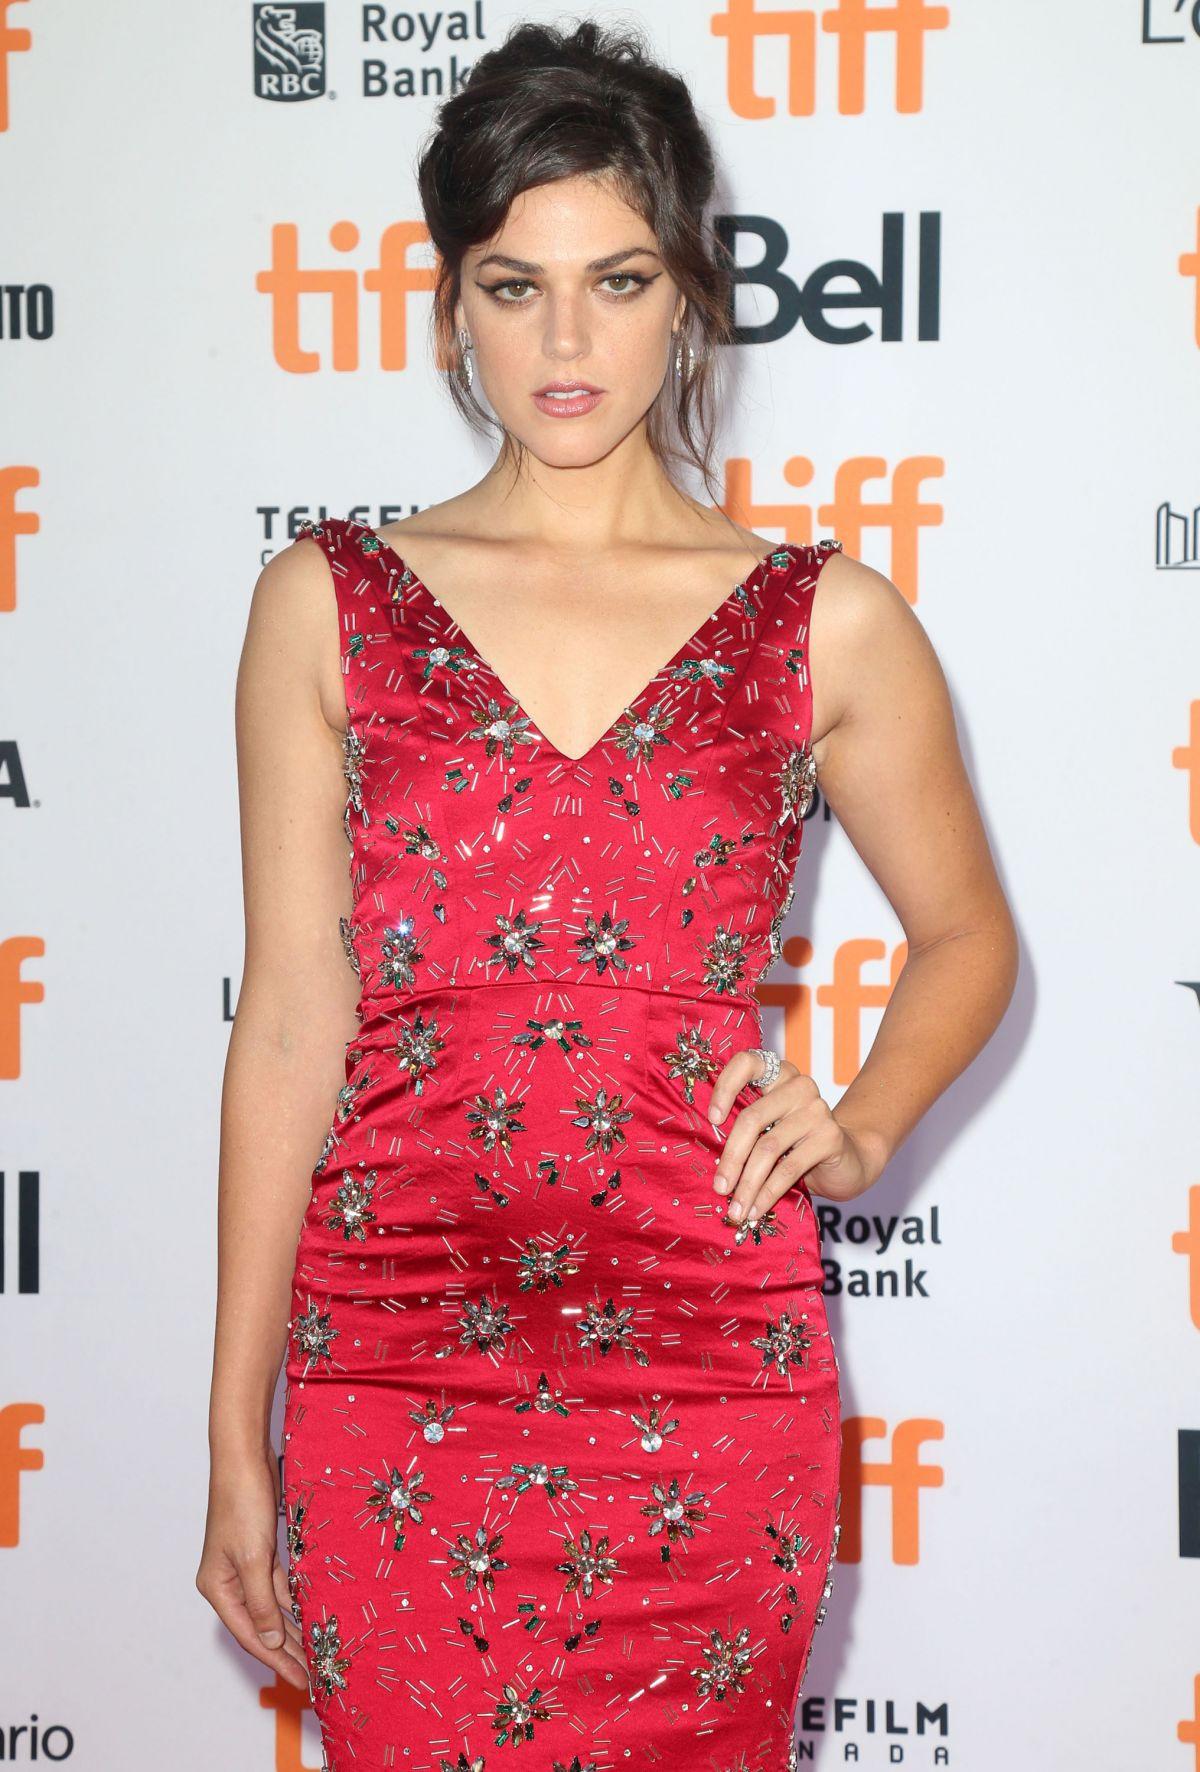 CALLIE HERNANDEZ at 'La La Land' Premiere at Toronto International Film Festival 09/12/2016